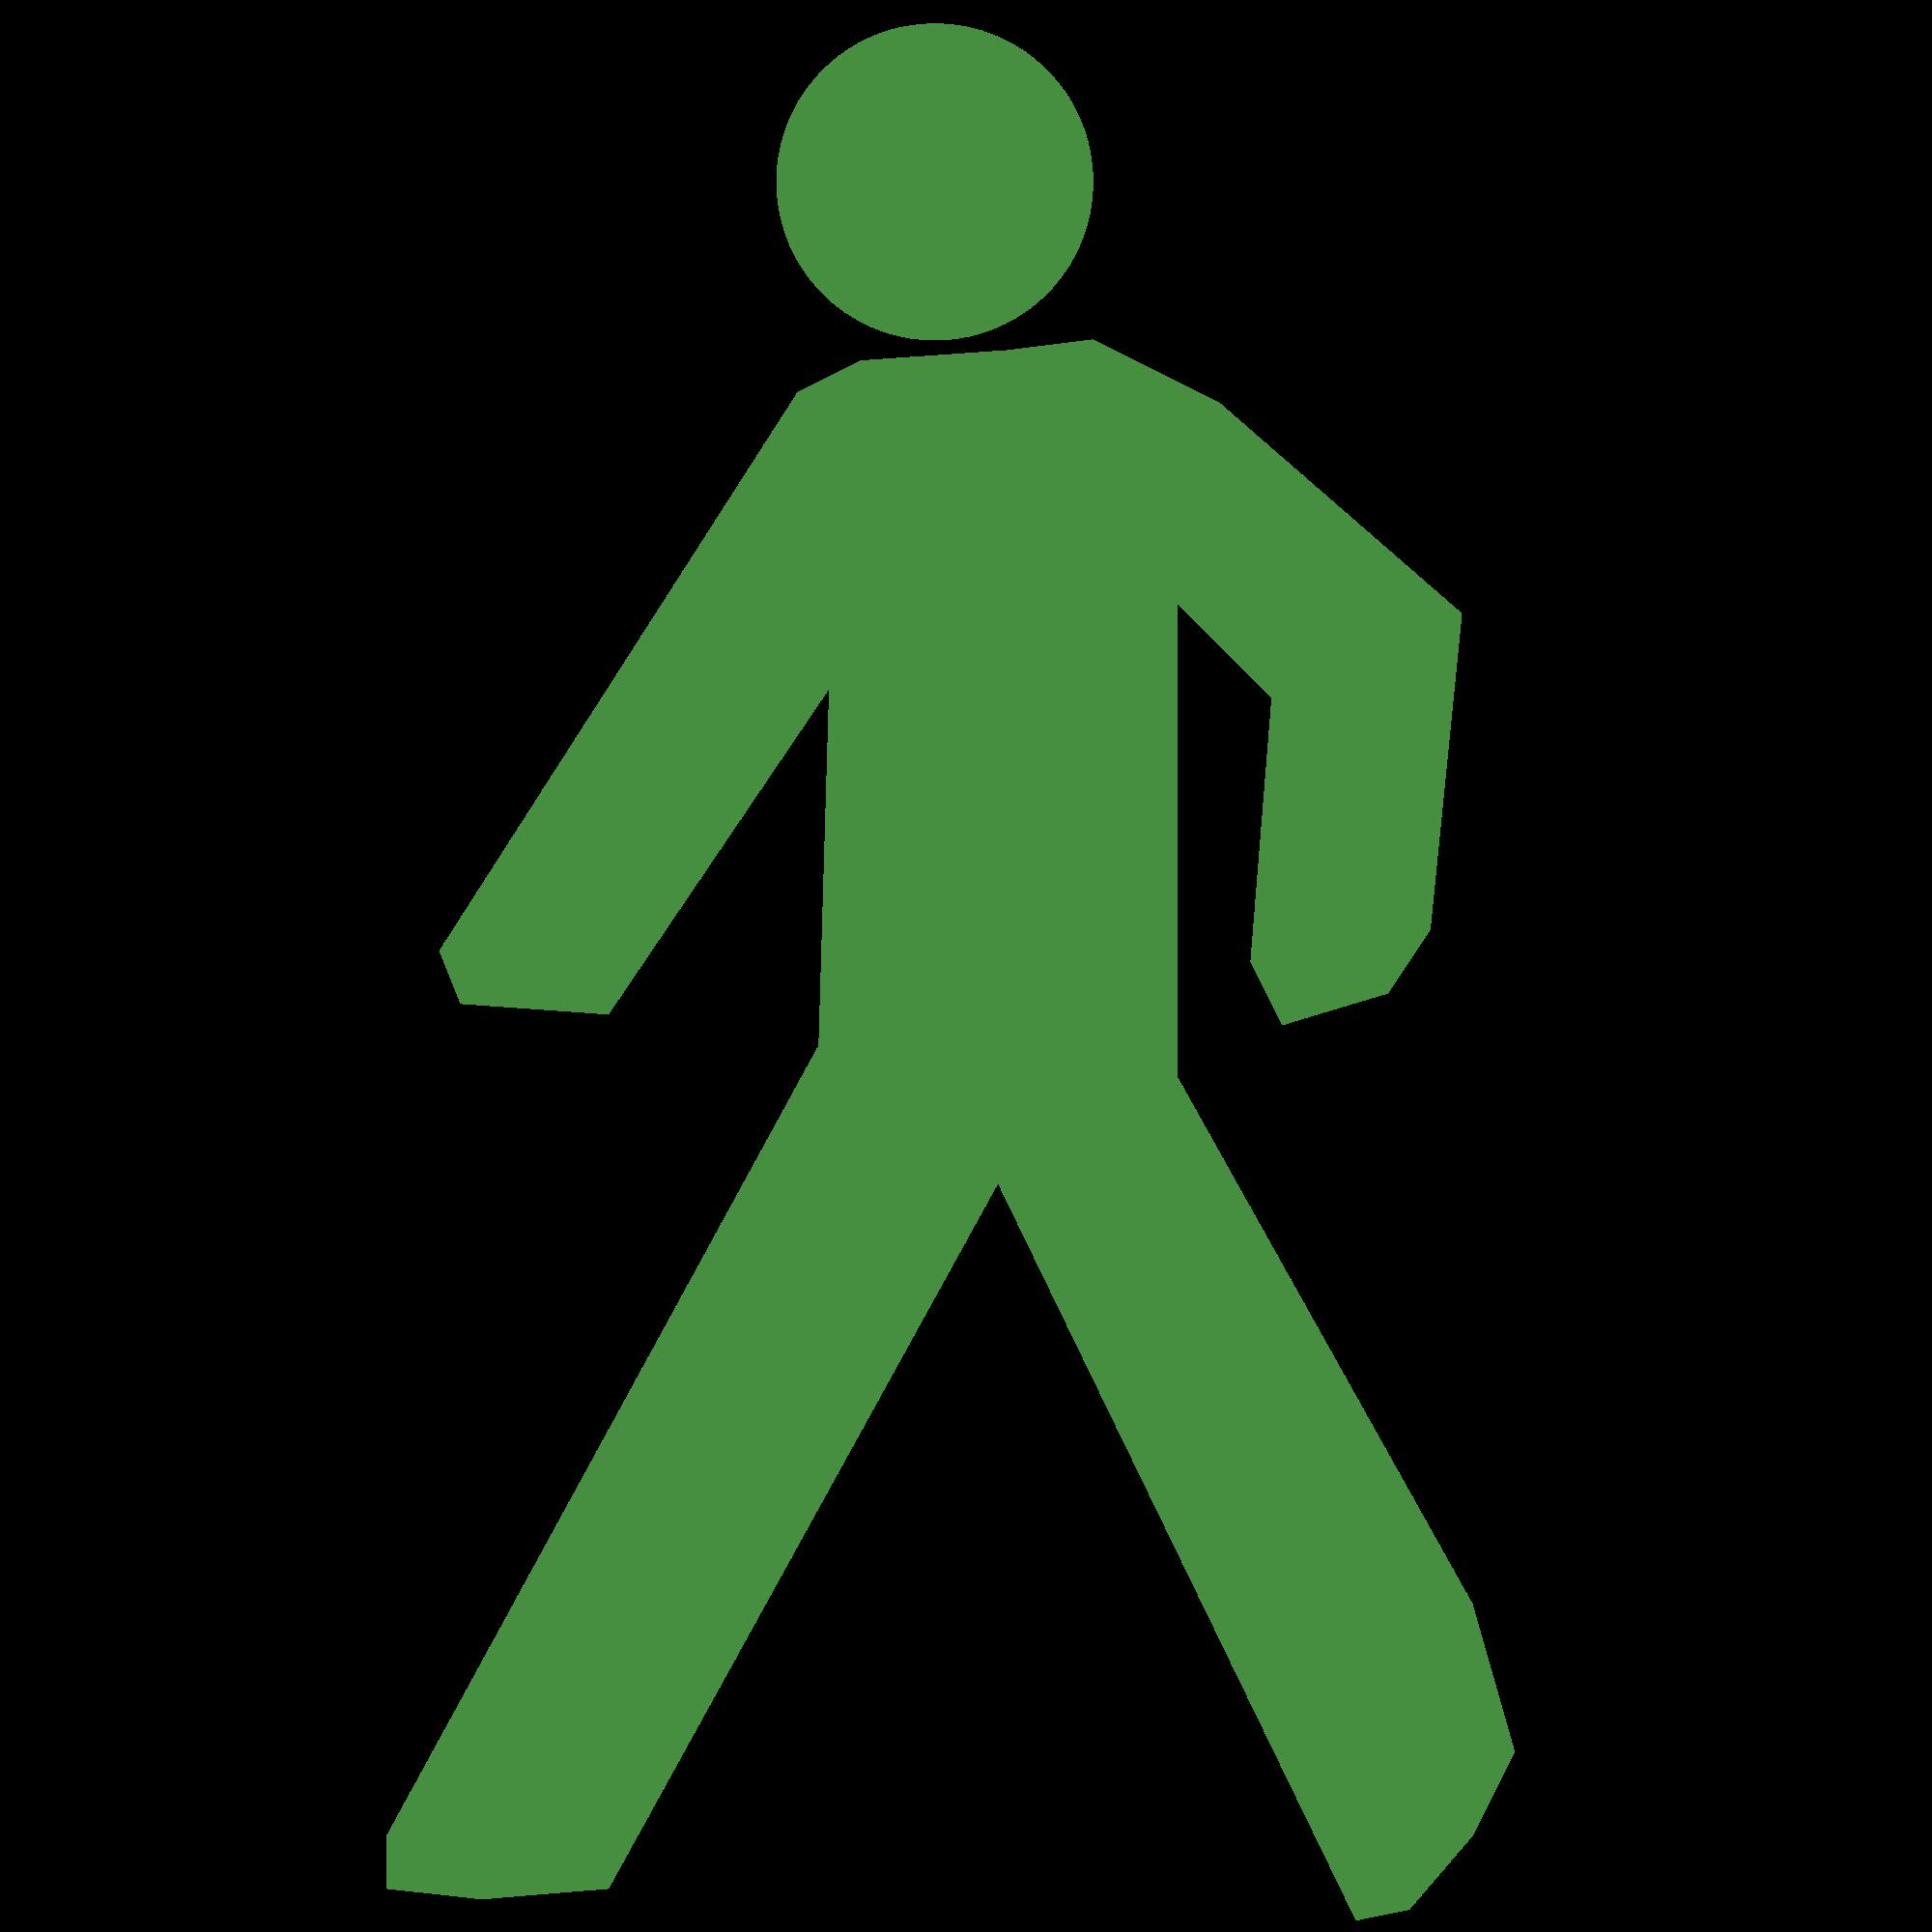 Clipart walking walk signal. File icon svg wikimedia